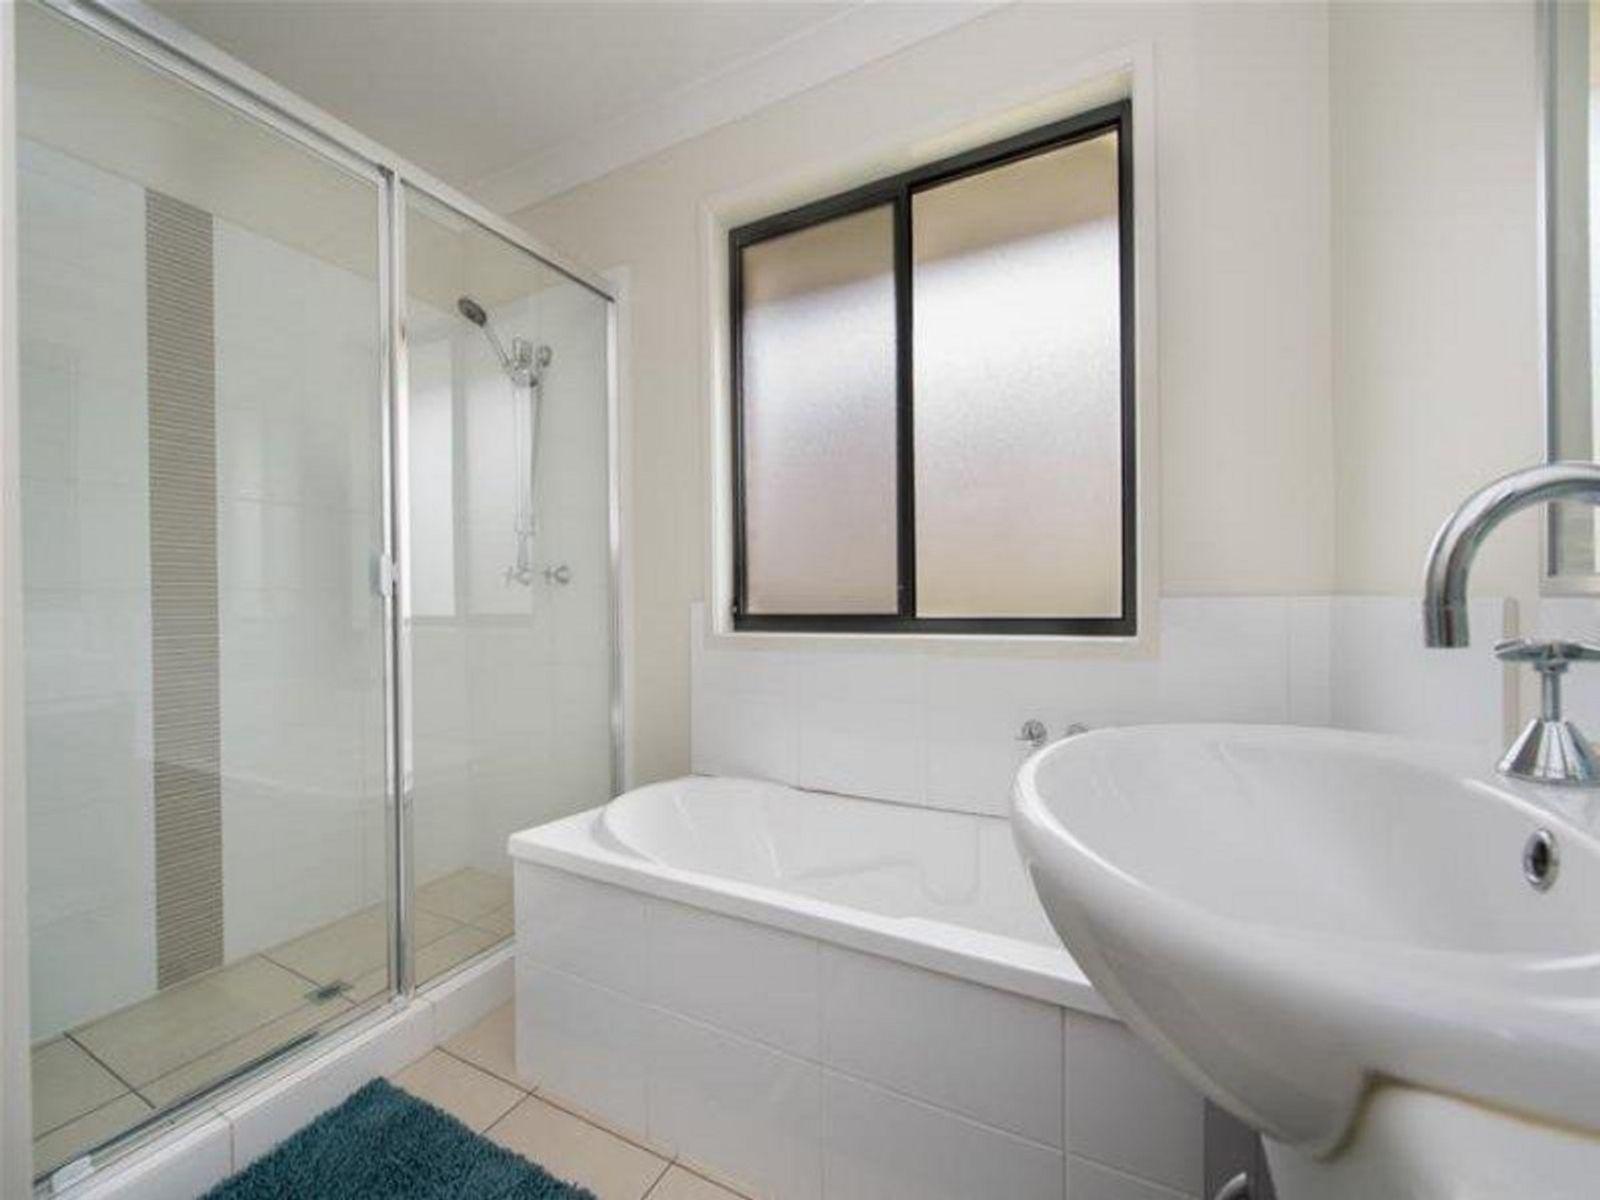 90 Hogg Street, Wilsonton Heights, QLD 4350